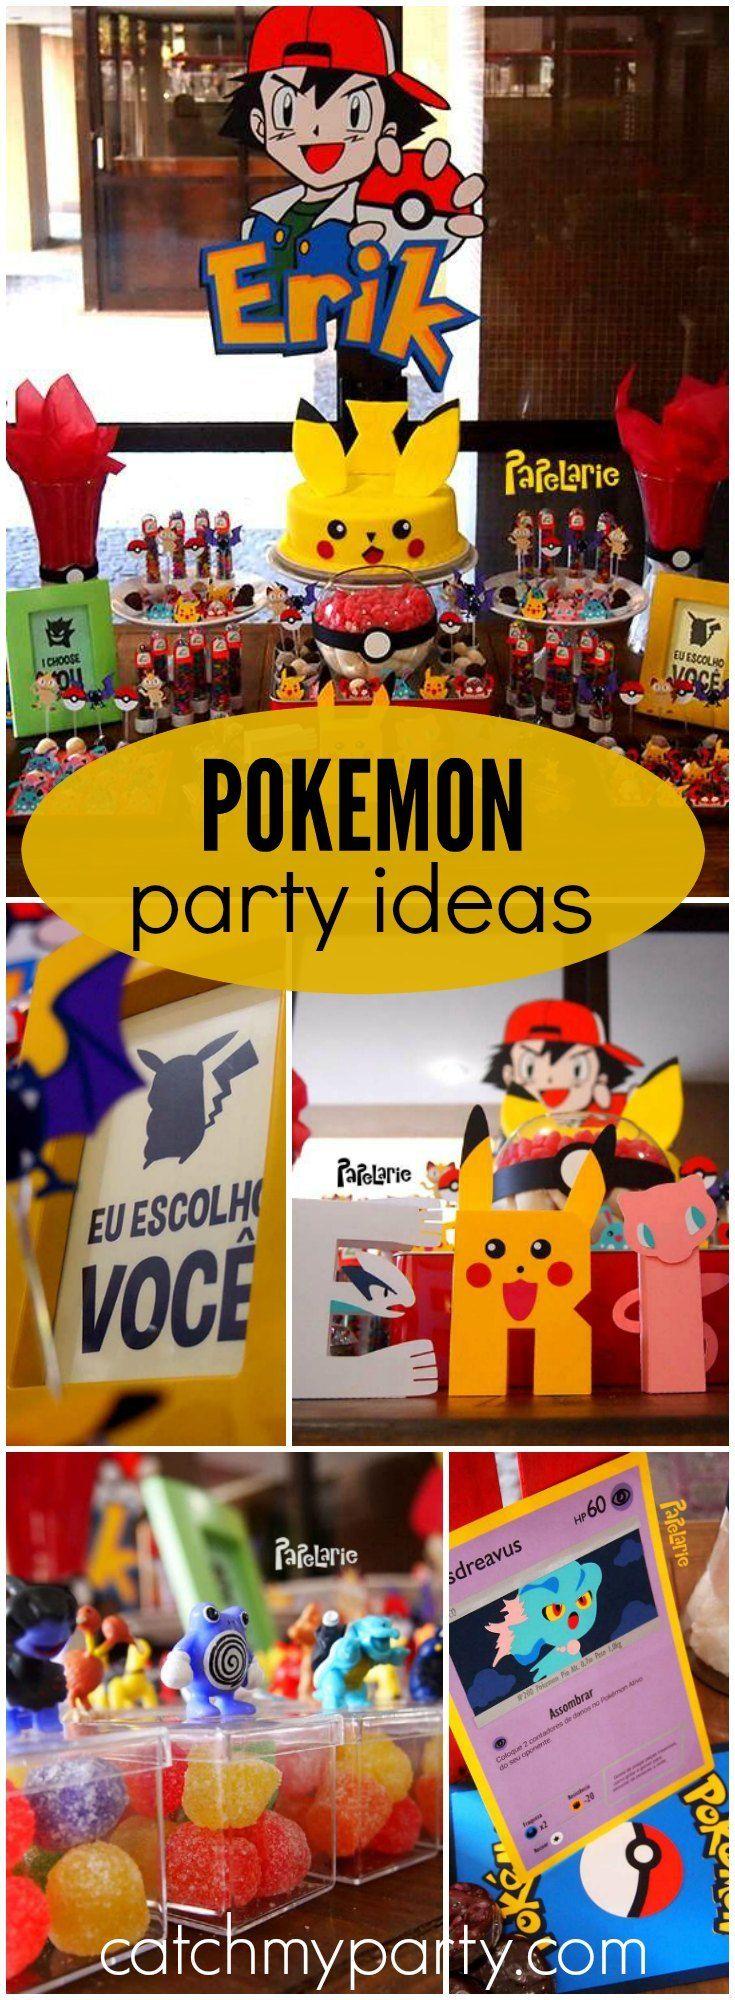 149 best Pokemon Party Ideas images on Pinterest | Birthdays ...